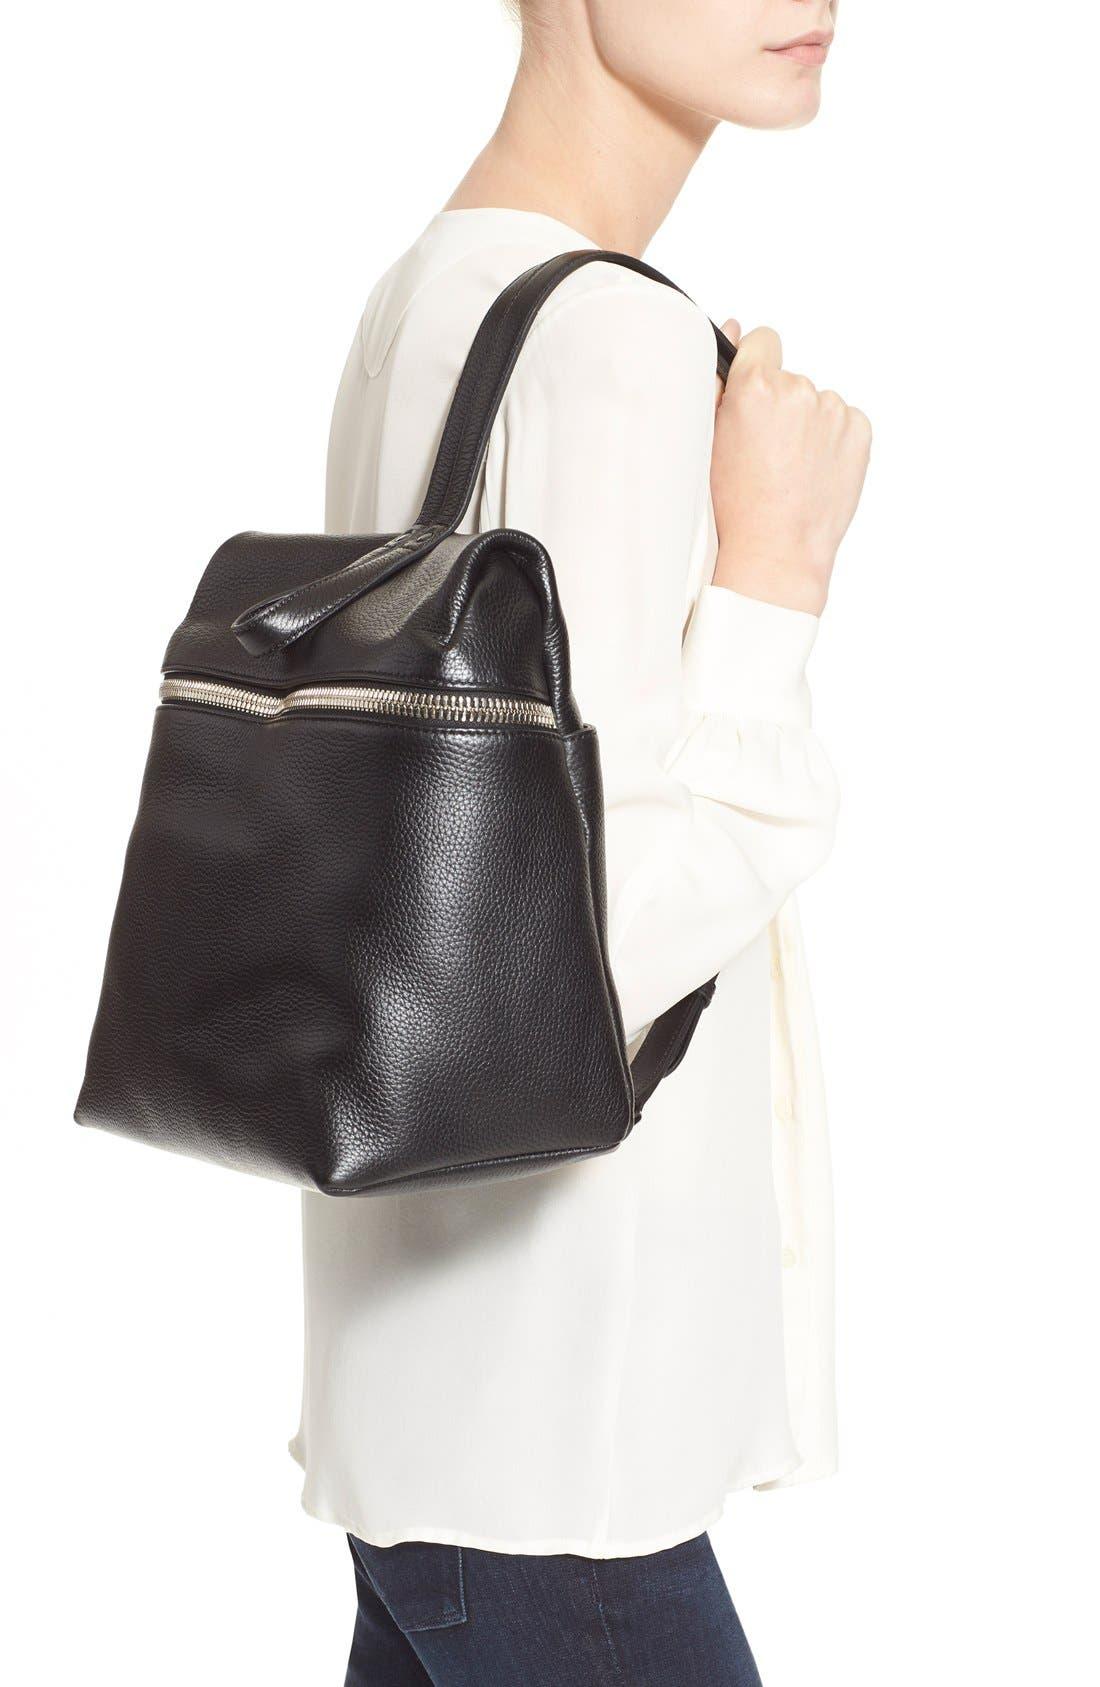 For Handbags amp; Kara Wallets Women Nordstrom Tag1wOxq